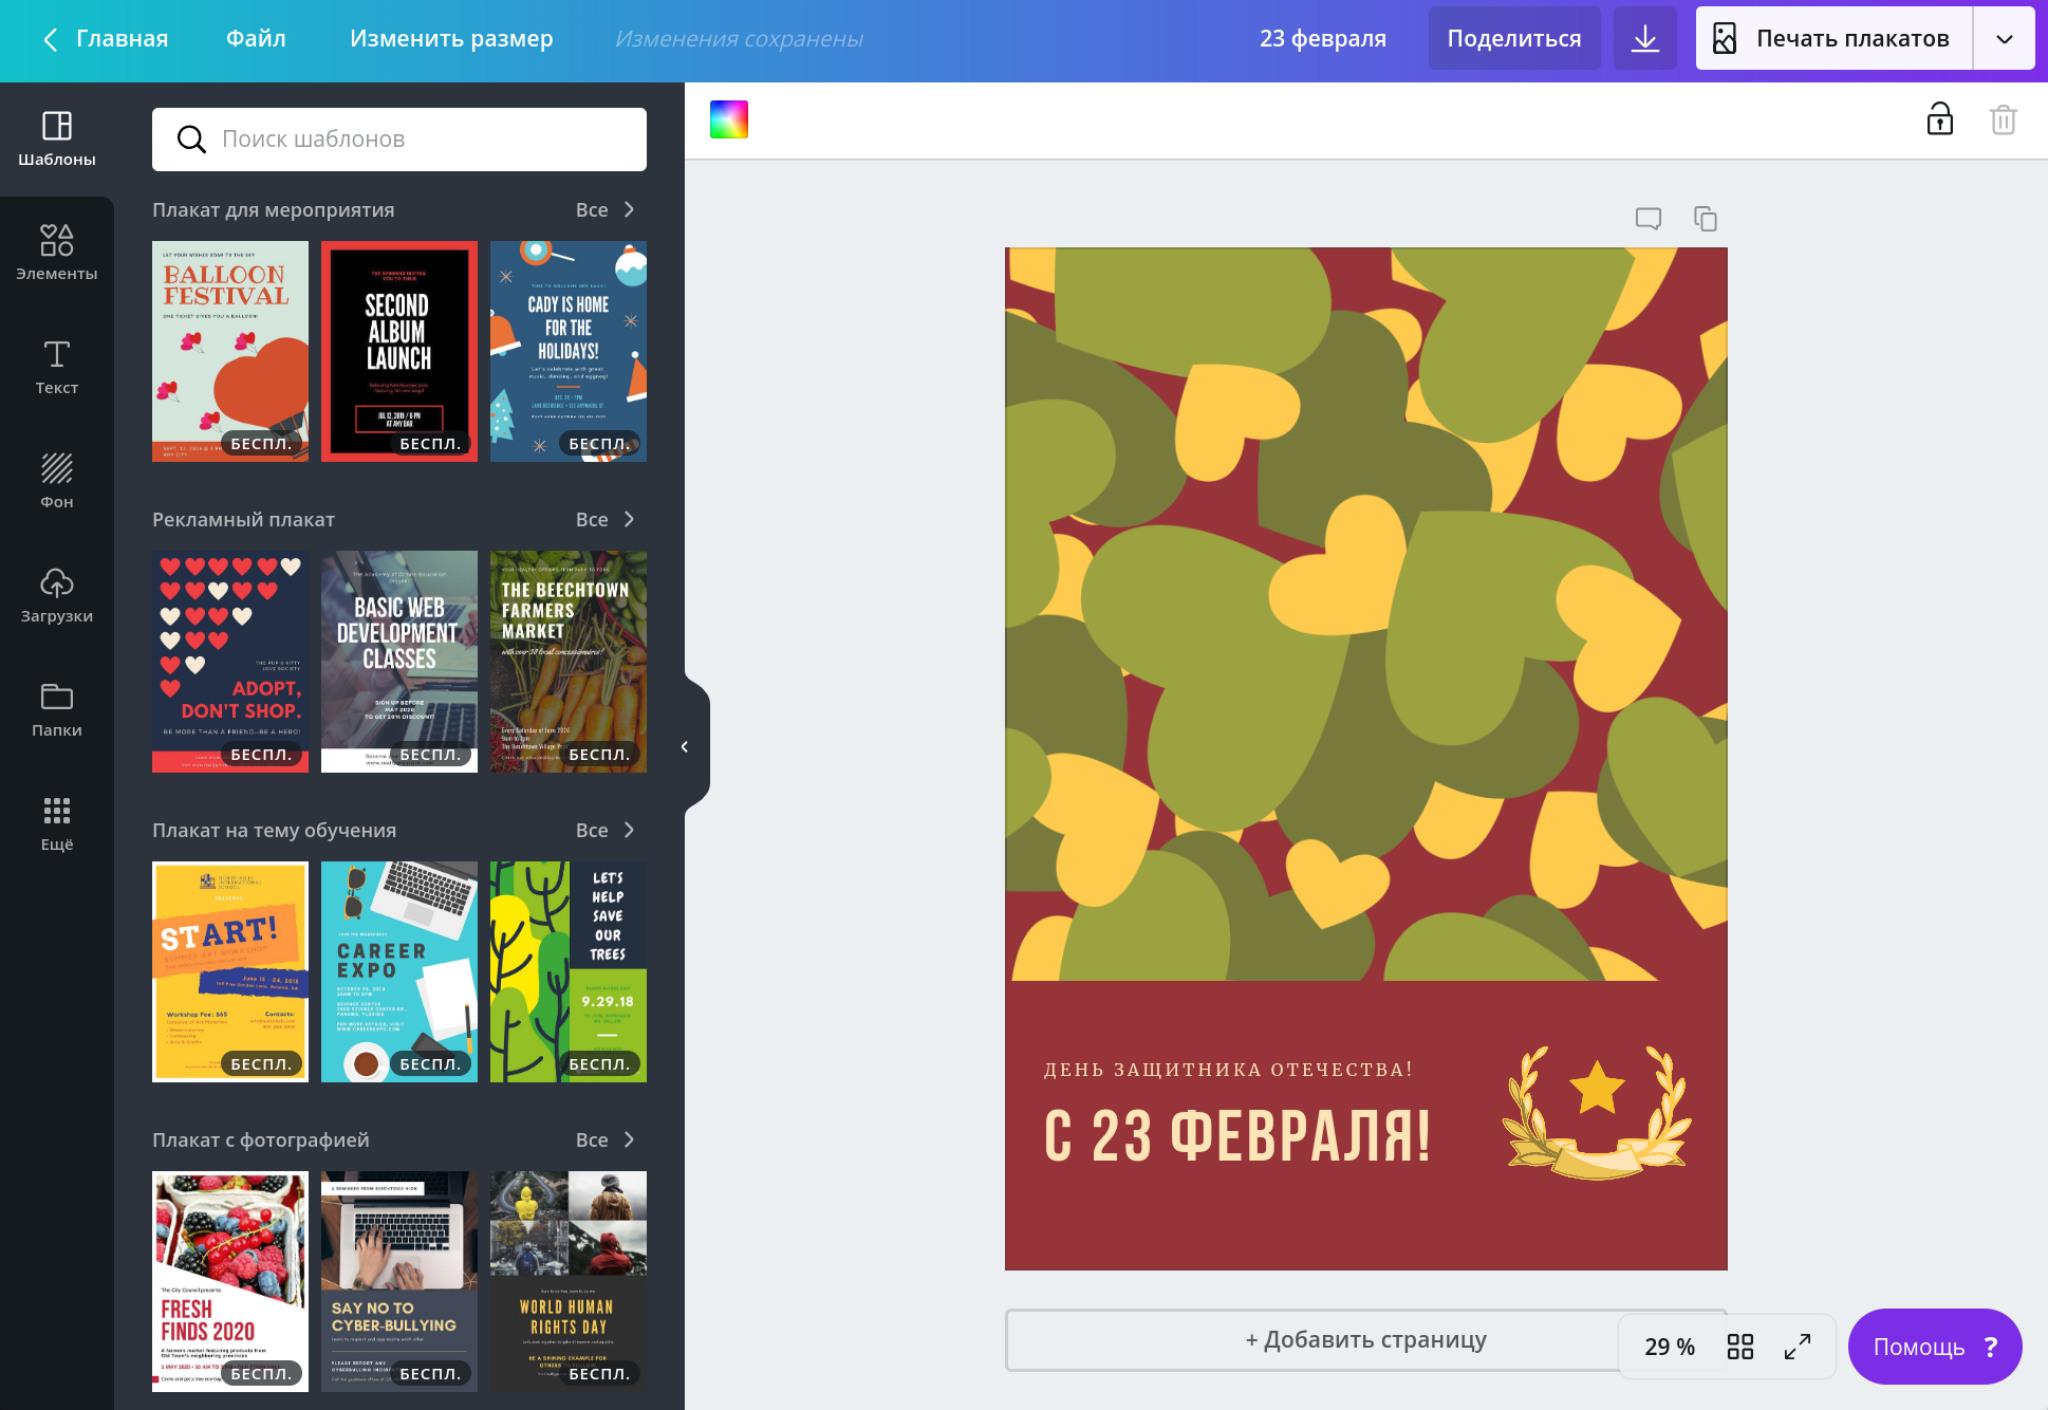 Дизайн плаката на 23 февраля на русском языке